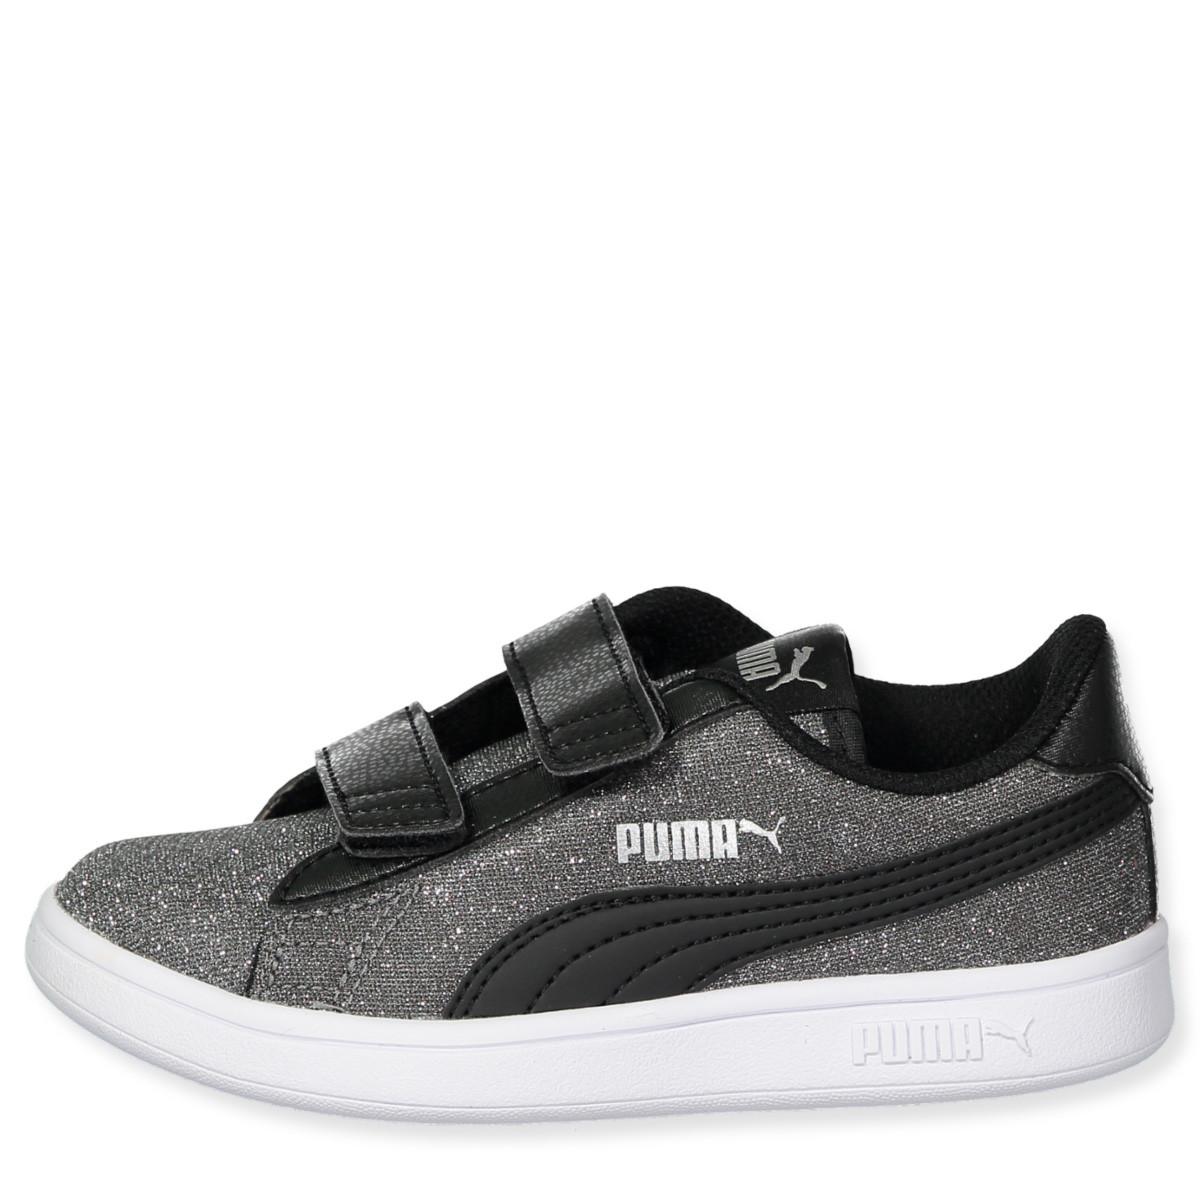 PUMA Smash v2 Glitz Glam Kid Girls' Trainers   Sneakers